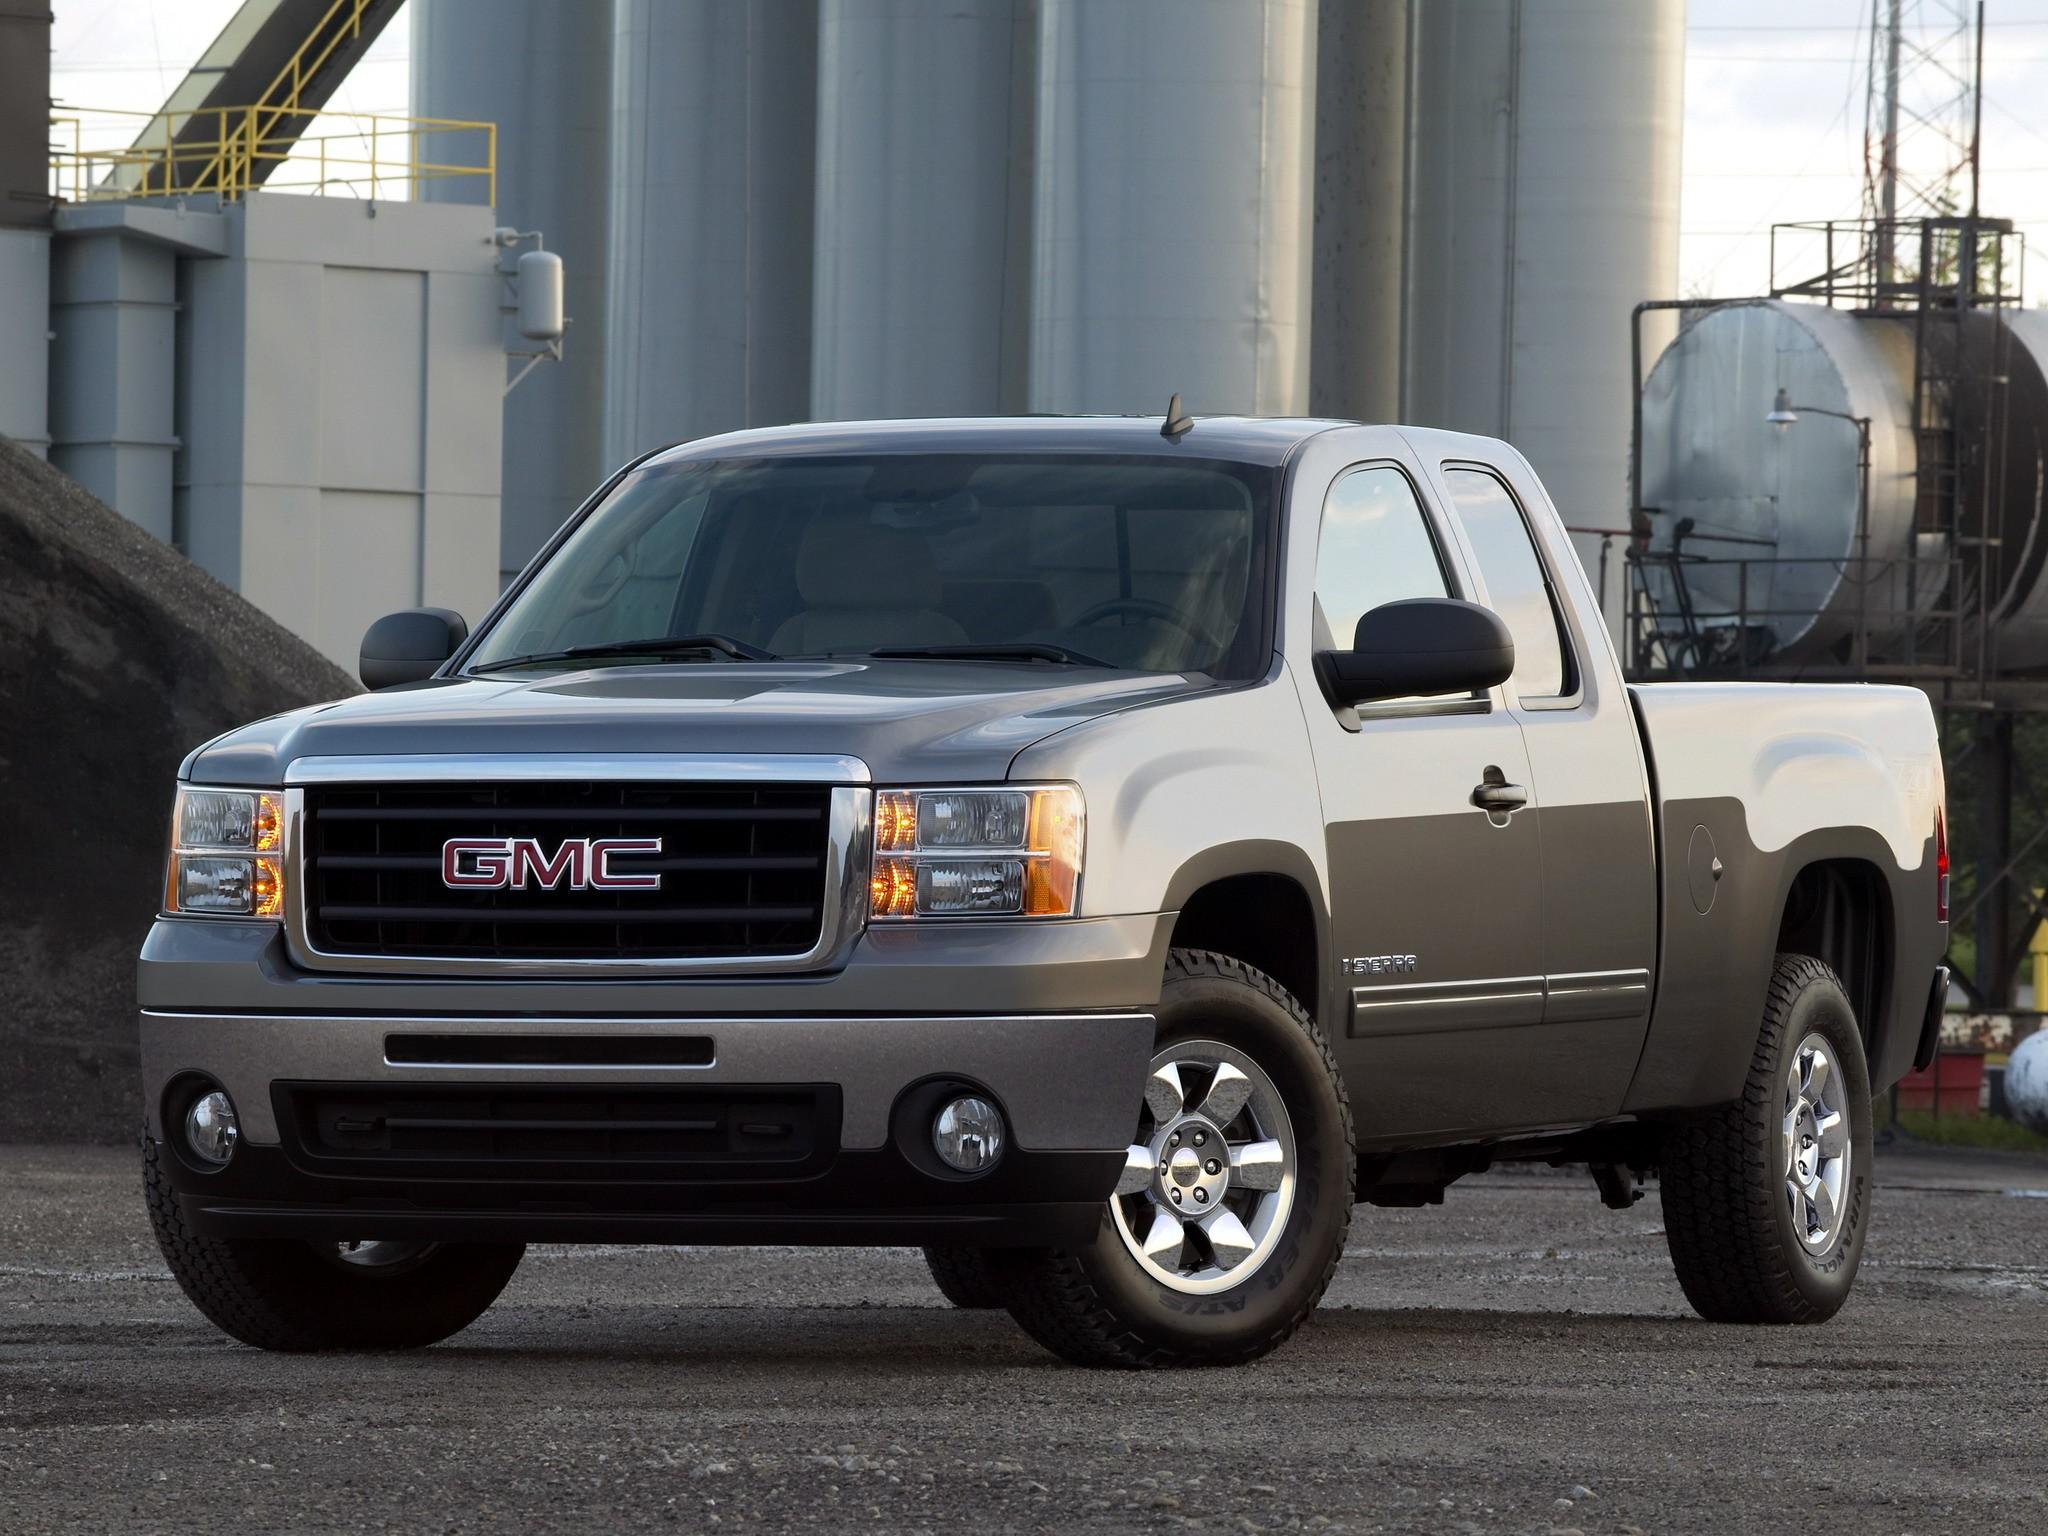 GMC Sierra 1500 Extended Cab - 2008, 2009, 2010, 2011 ...